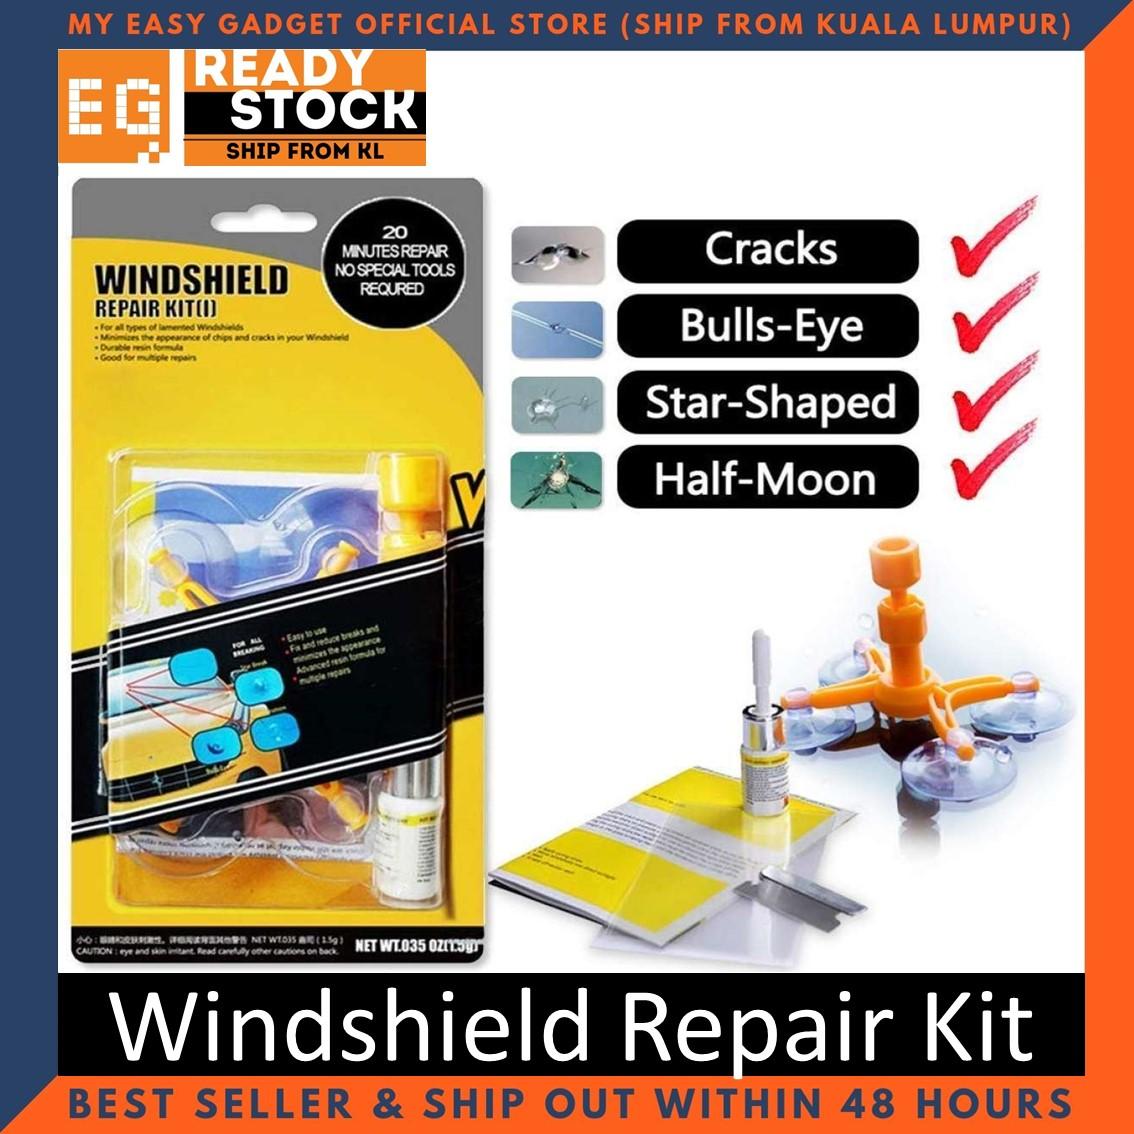 Kit Tampal Retak Cermin Kereta / Windshield repair kit - Ready Stock - Ship from Malaysia